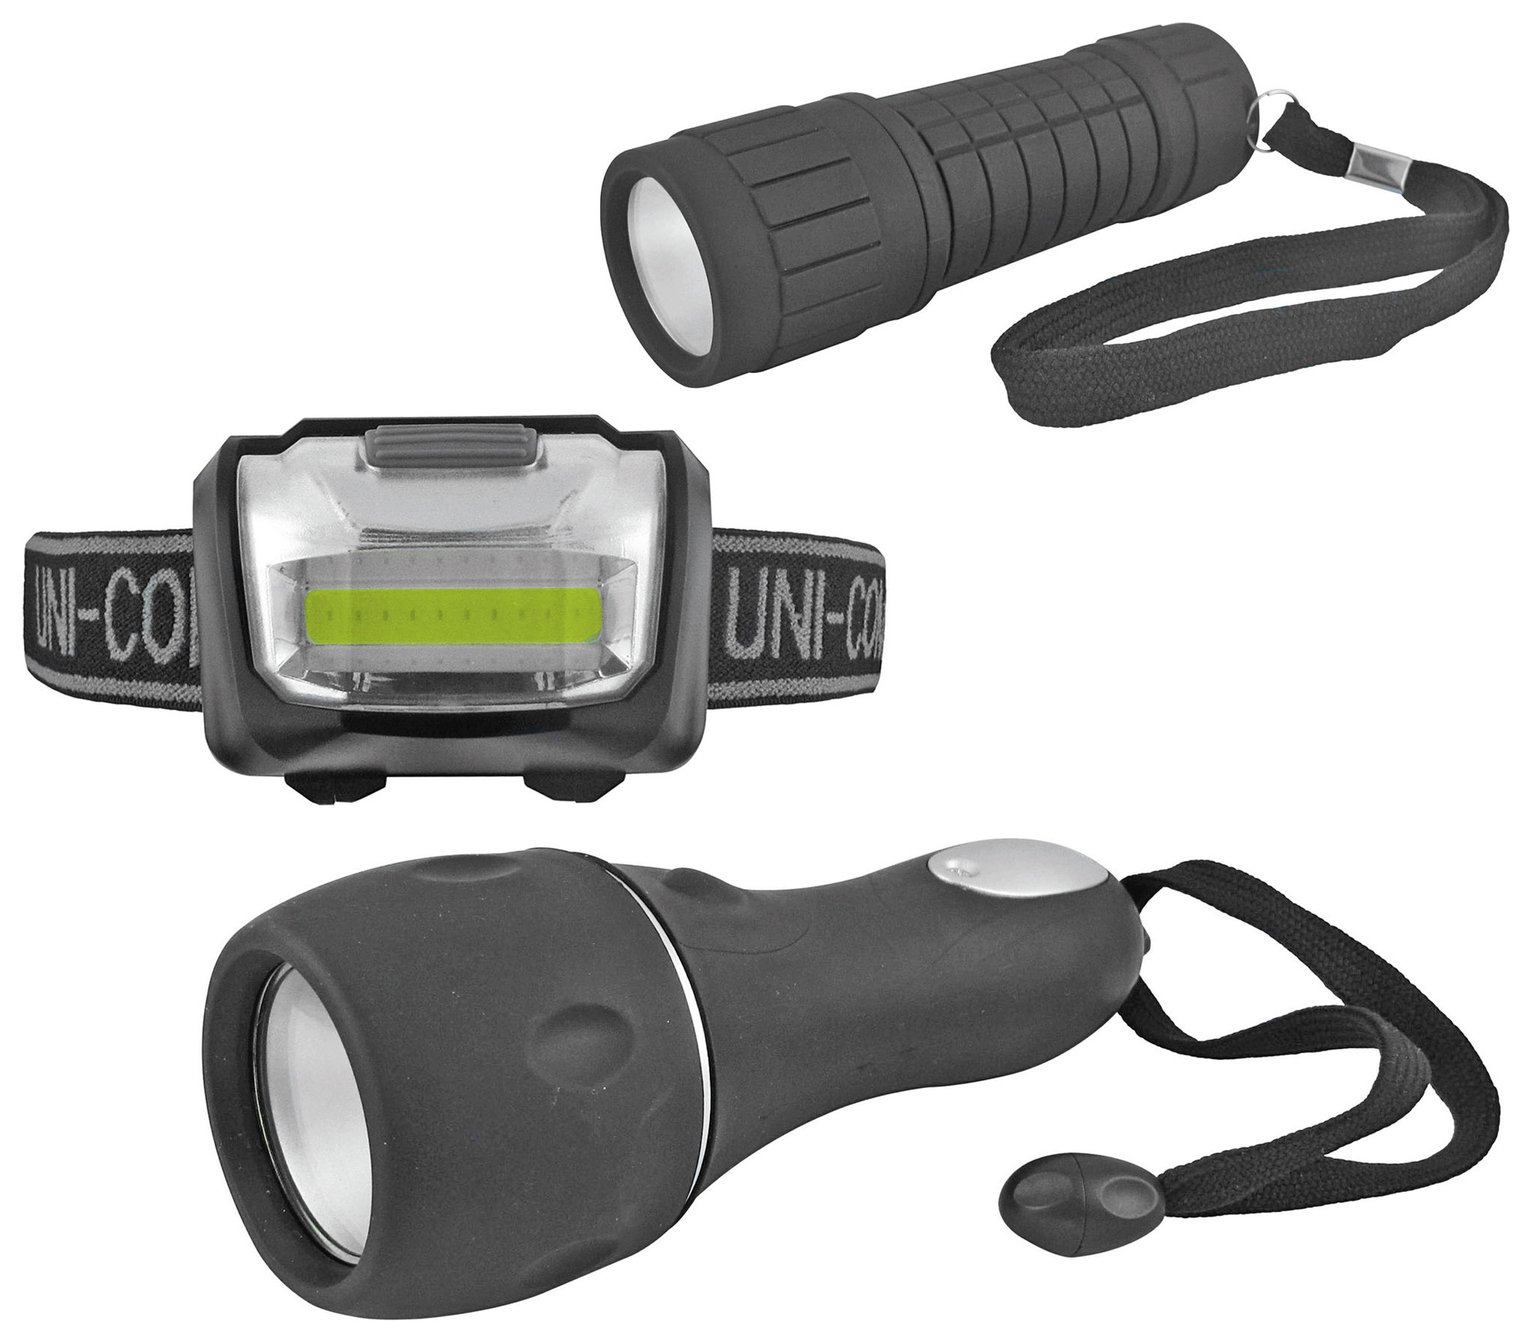 Uni-Com COB LED Torch Set